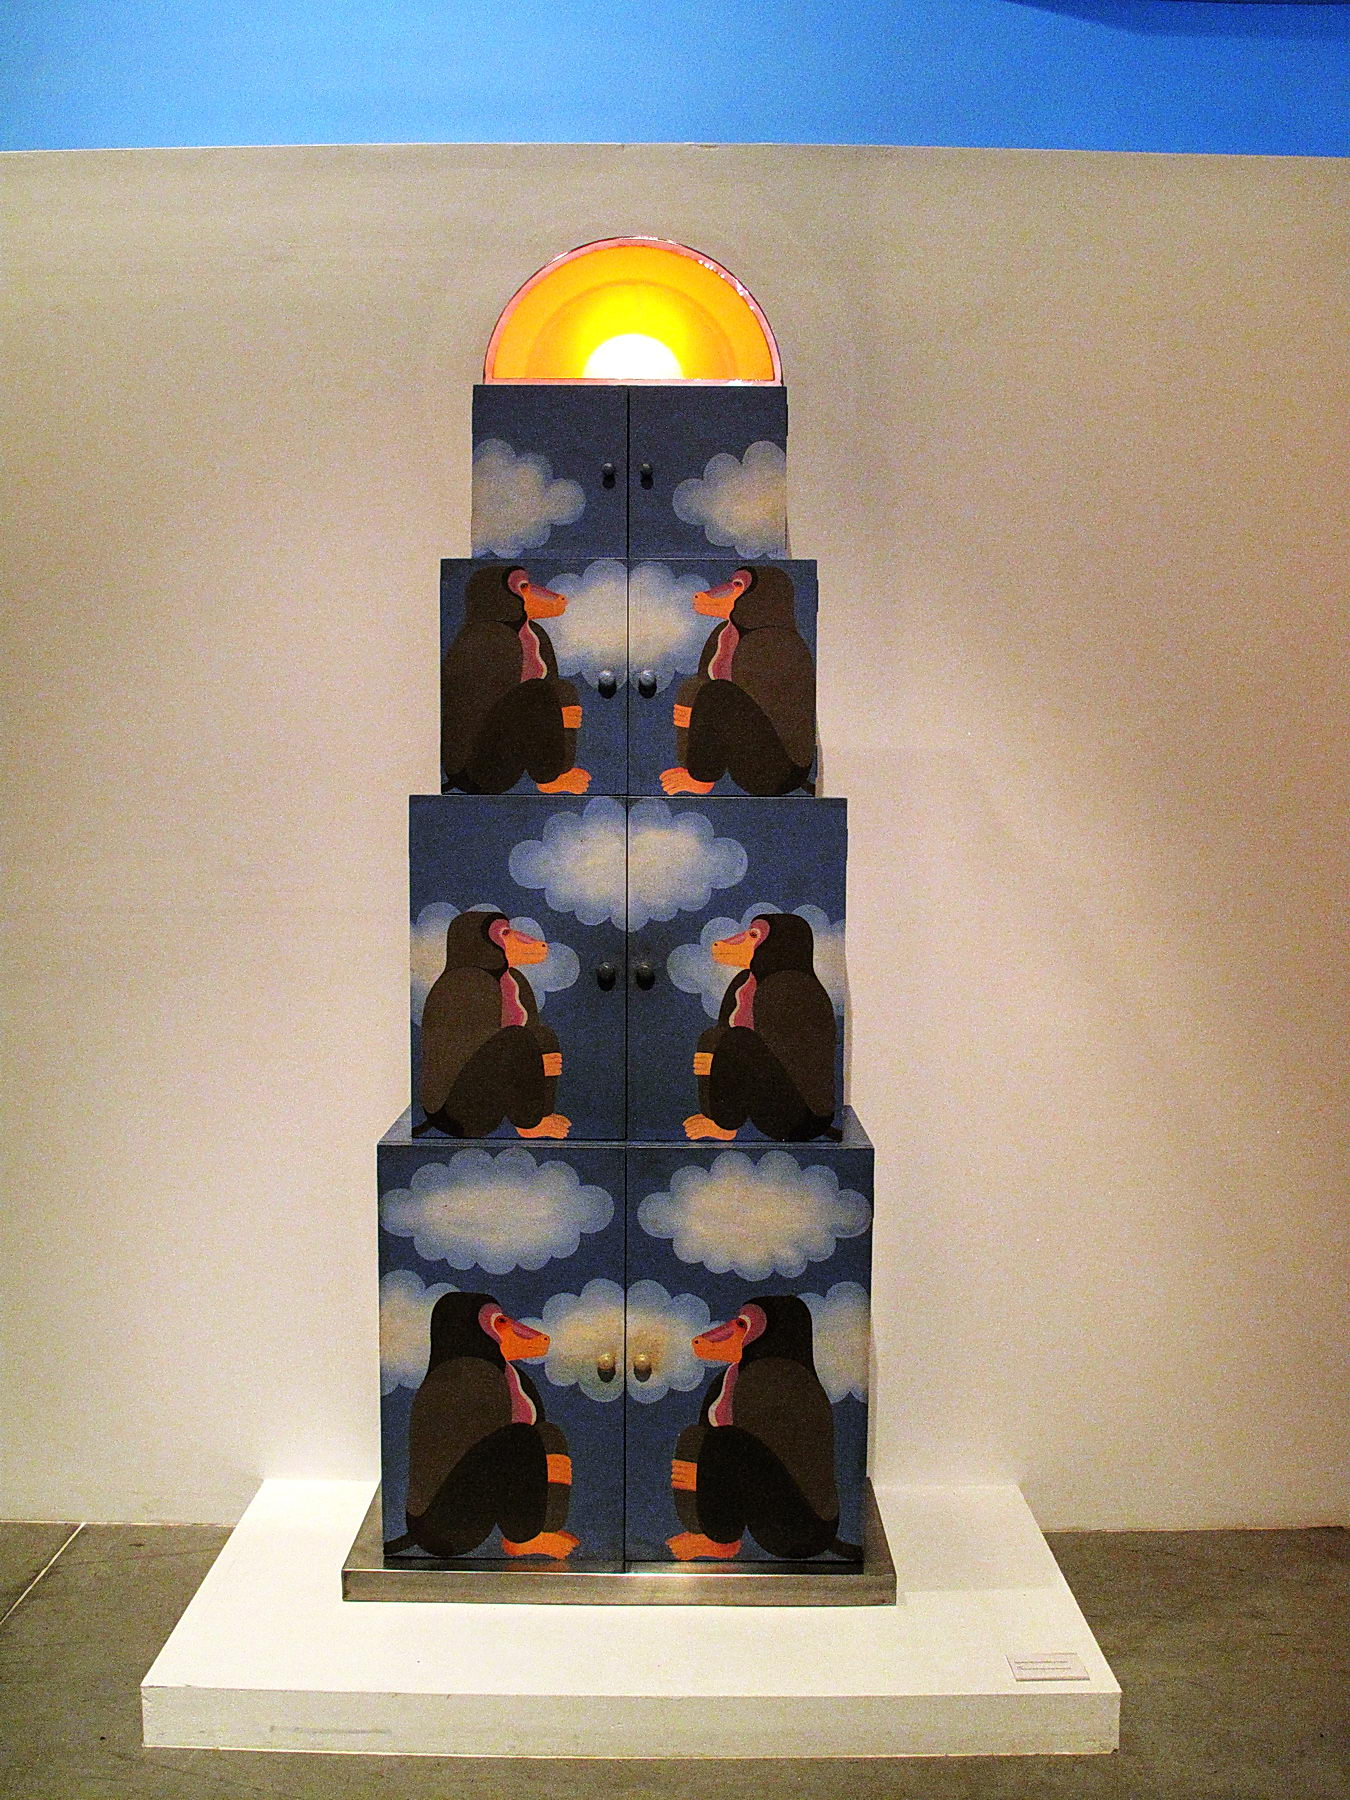 13-Edgardo Gimenez-Mueble de mandriles y nubes | RƎV